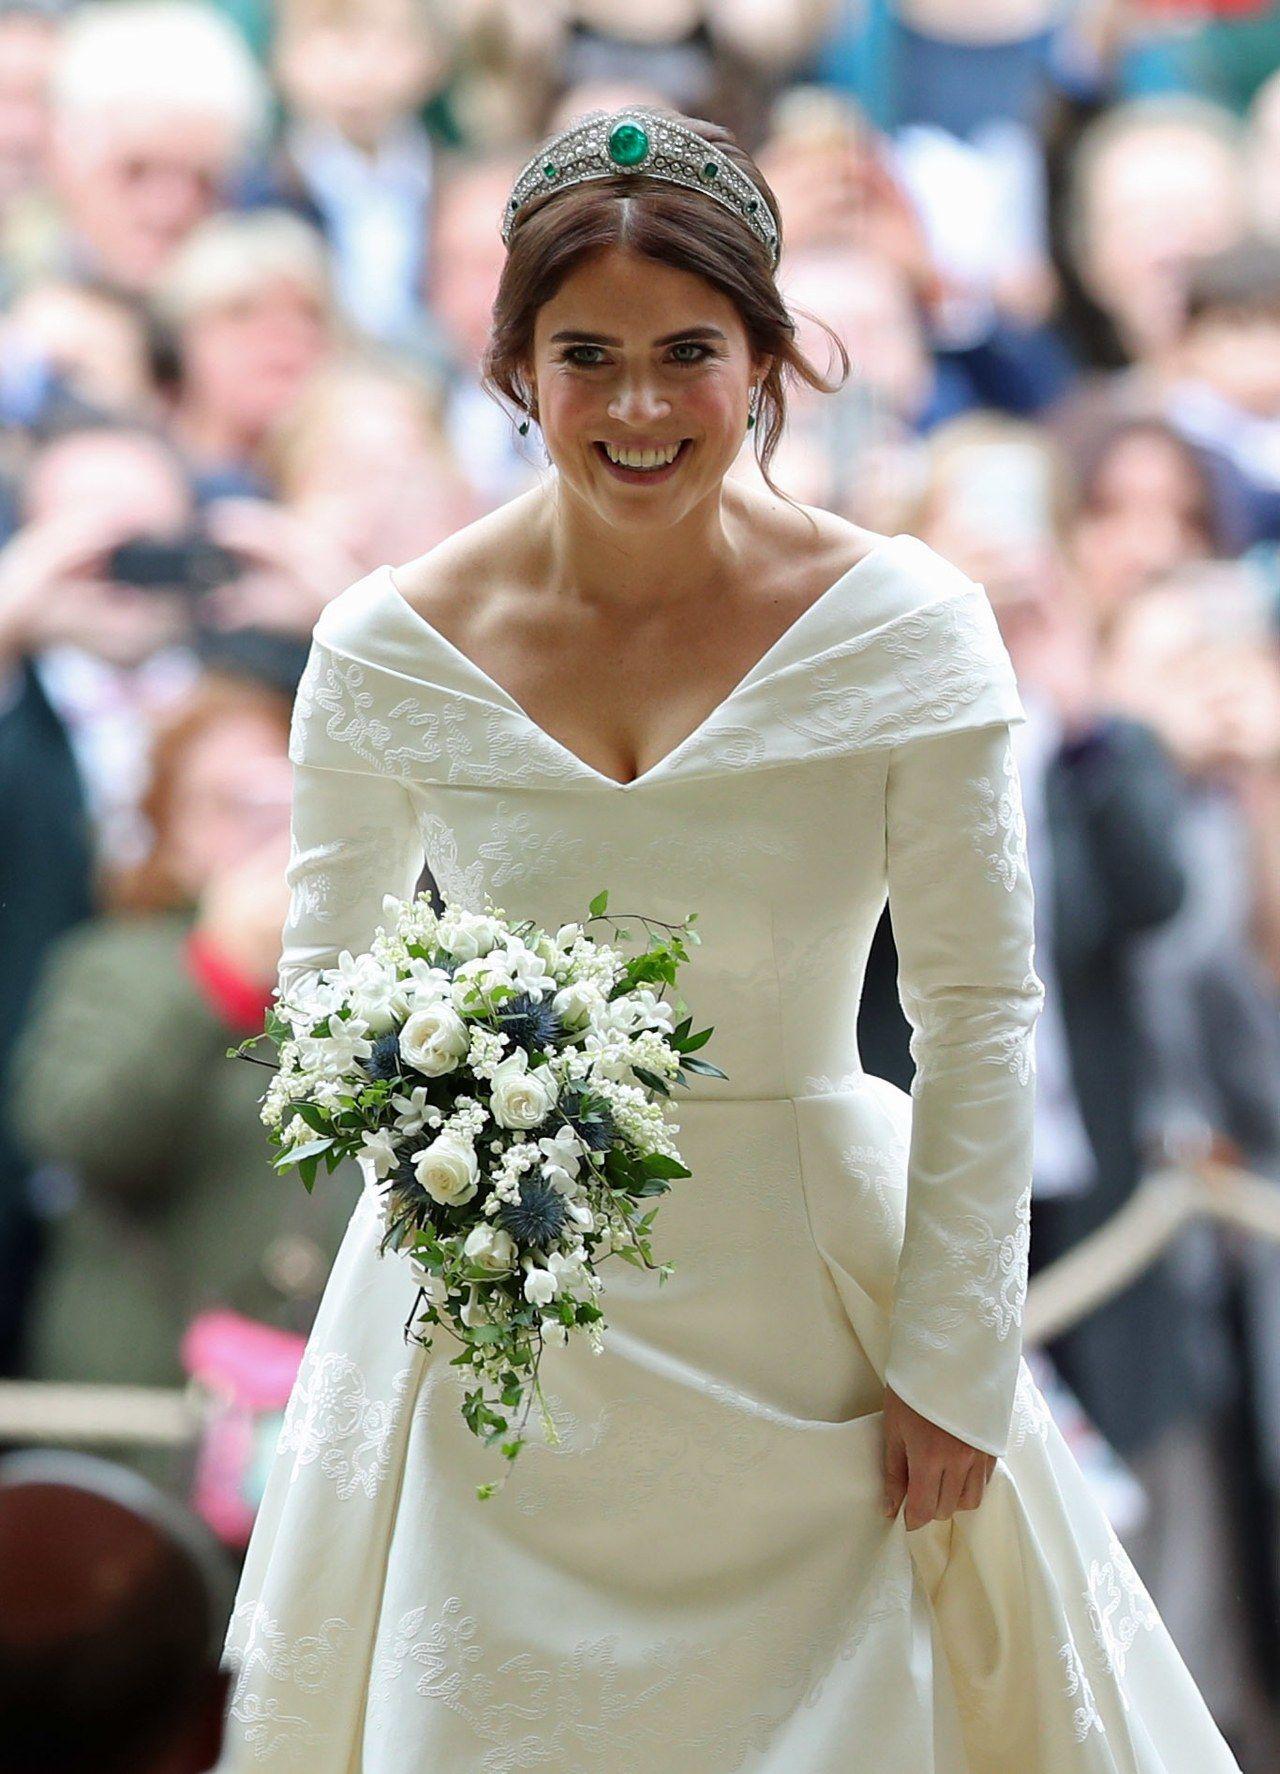 Royal wedding dress  The Meaning Behind Princess Eugenieus Gorgeous Royal Wedding Dress